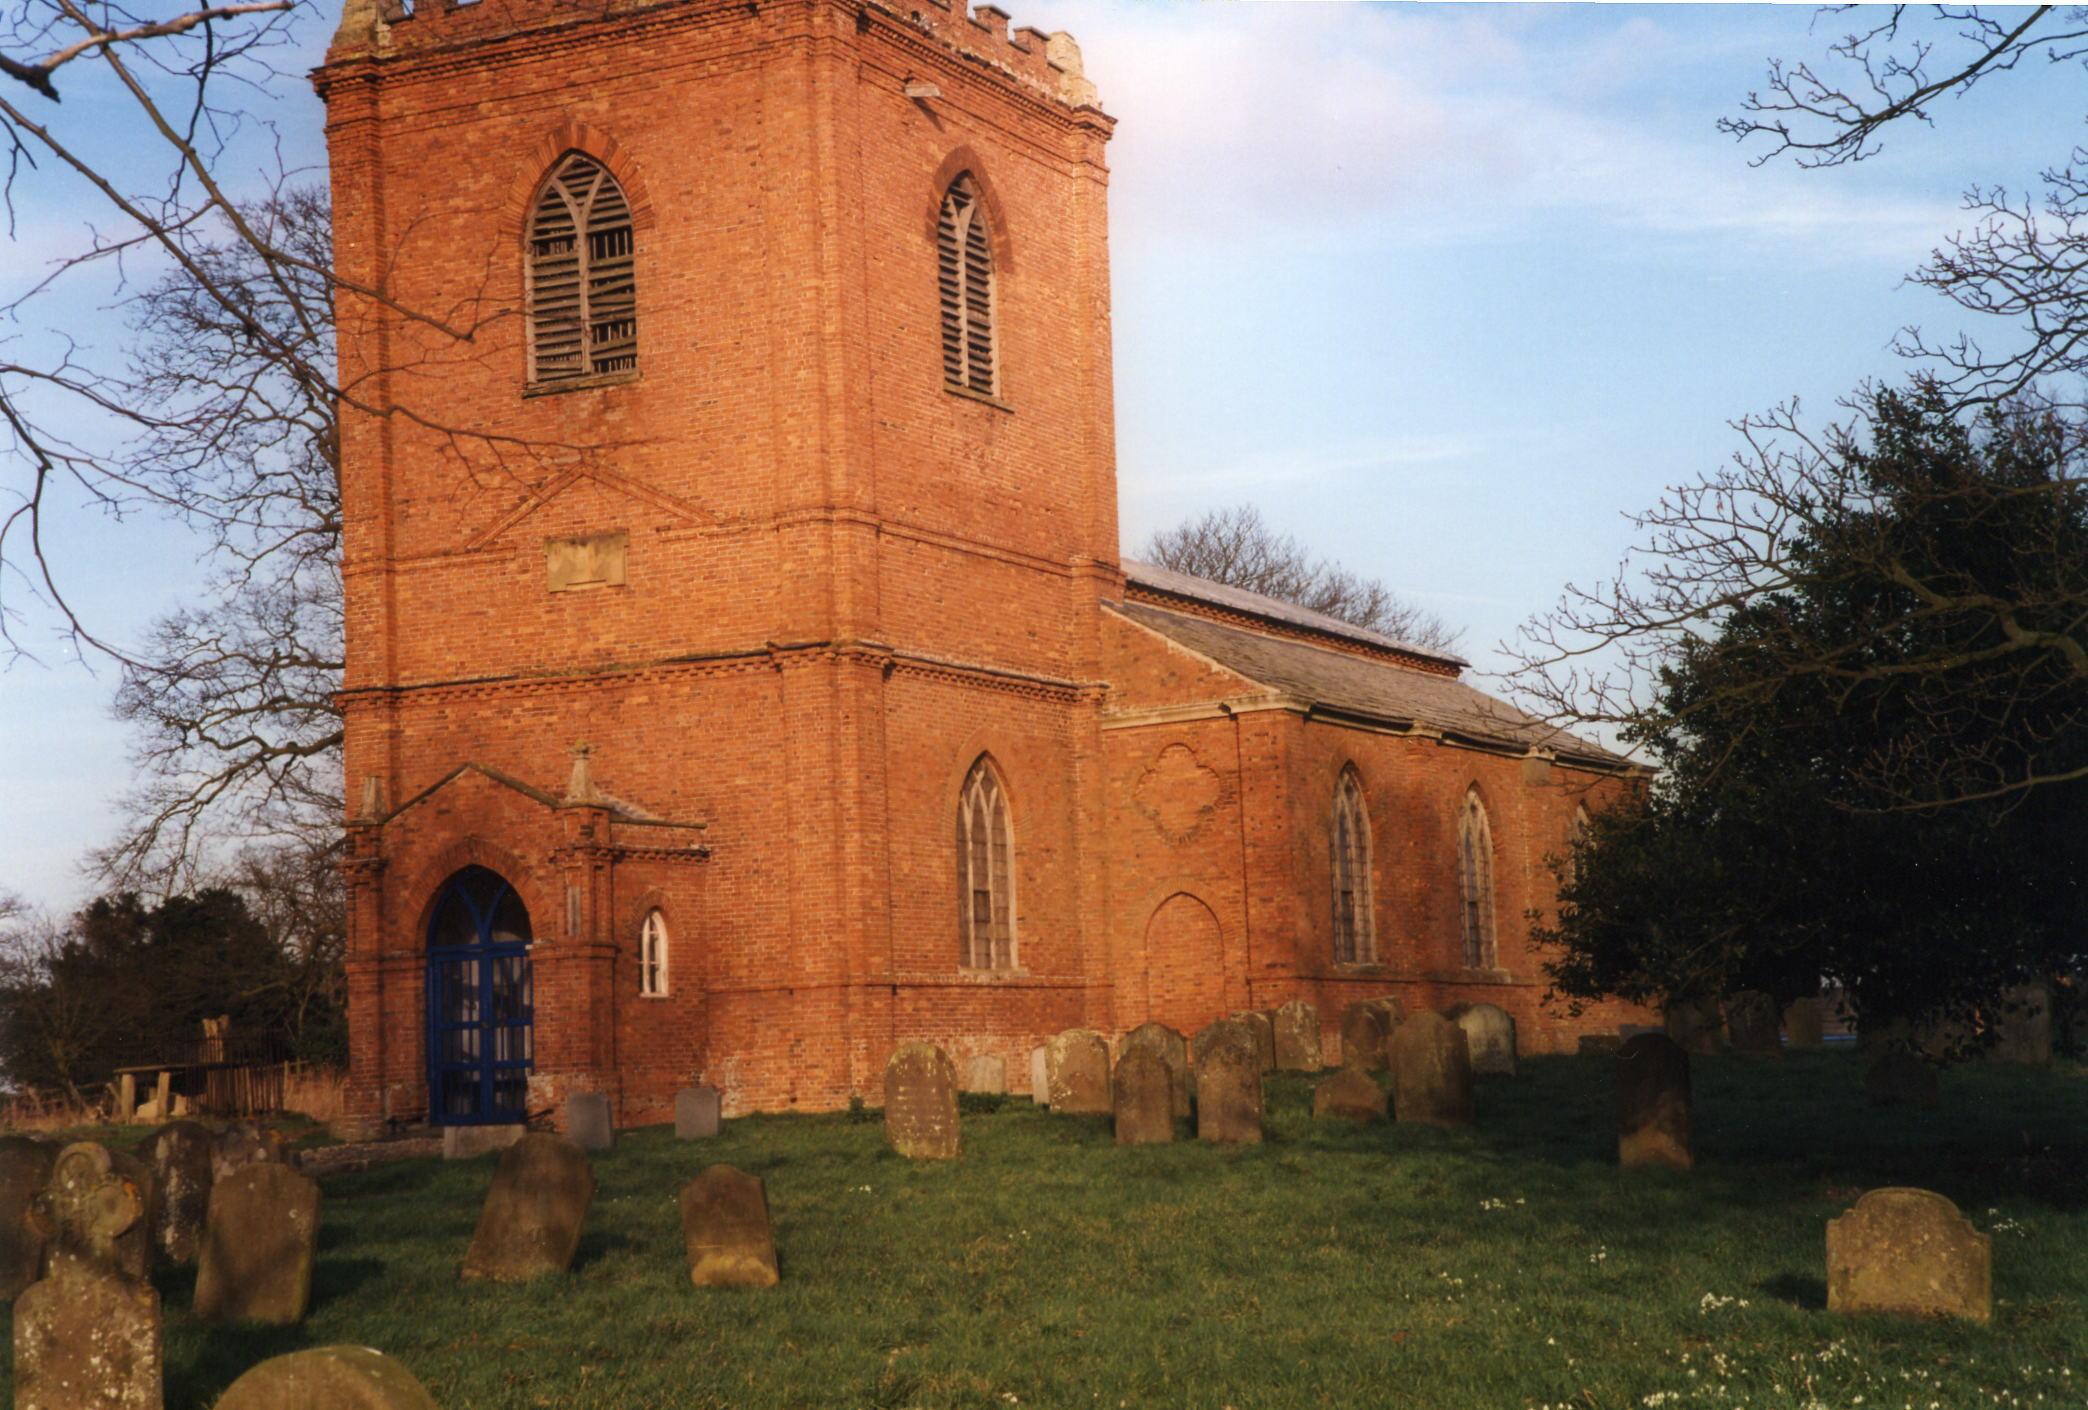 St. Swithin Church